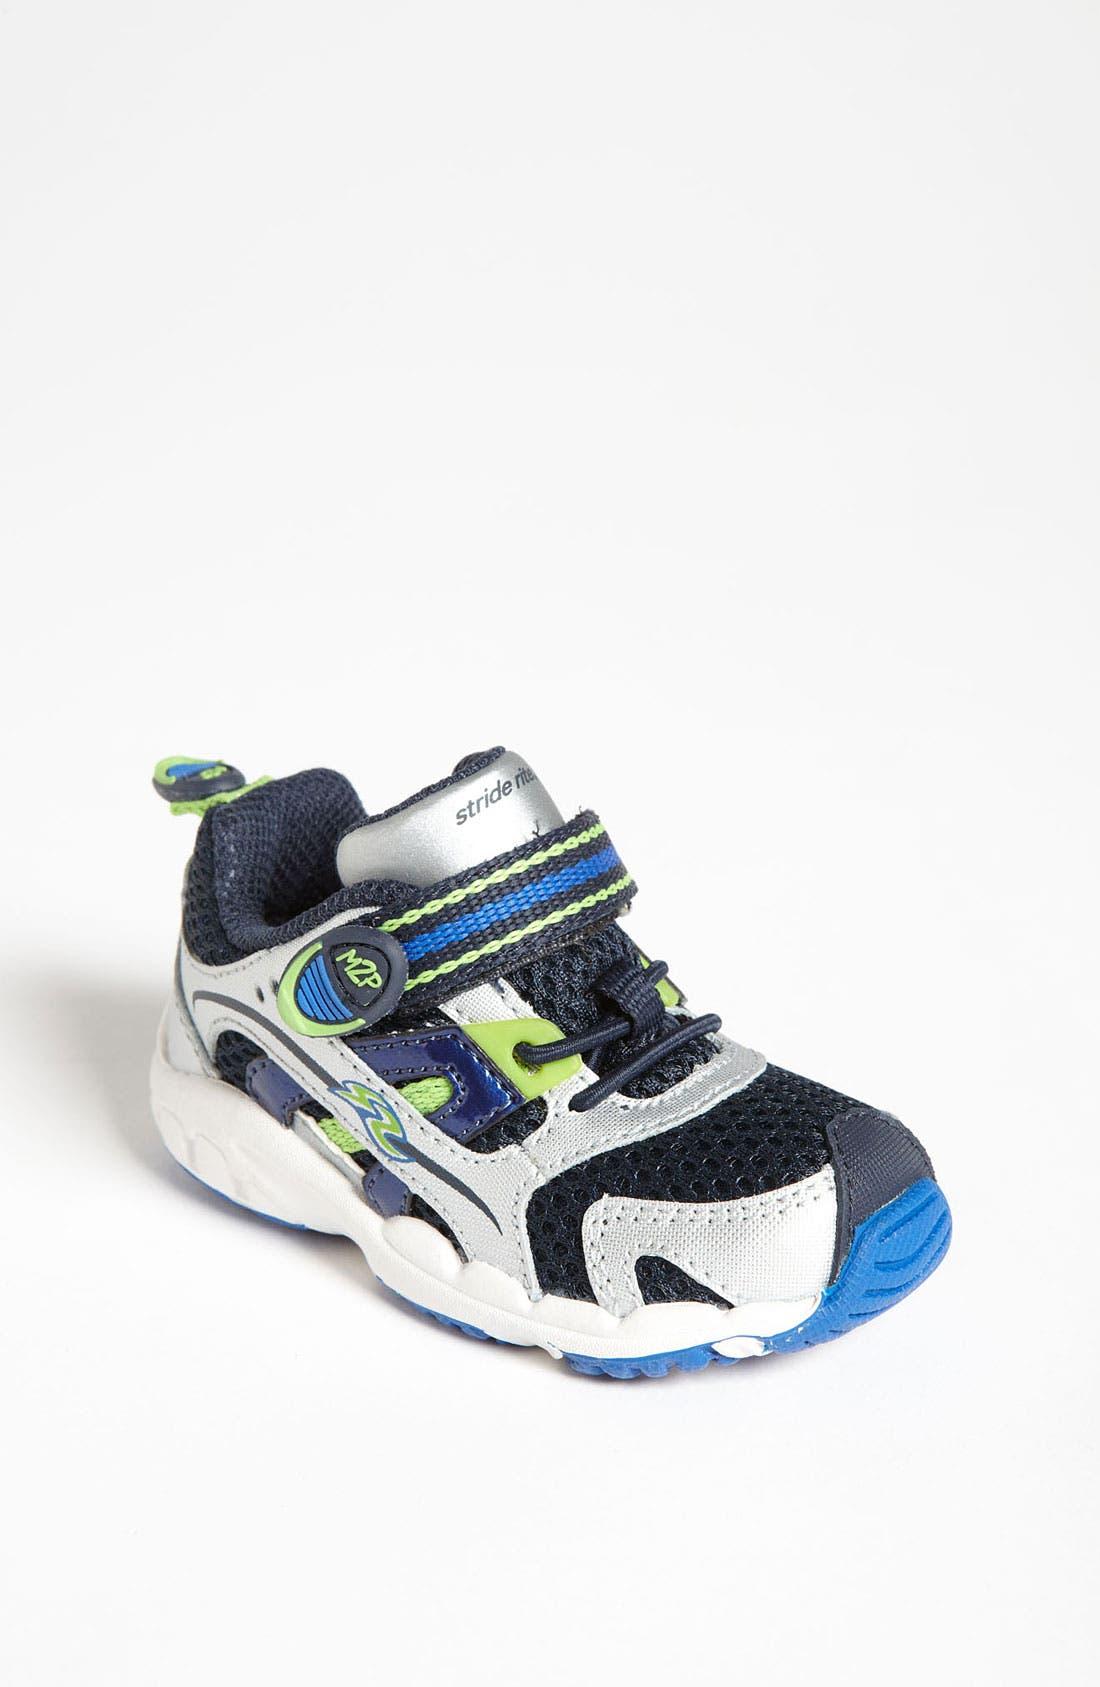 Alternate Image 1 Selected - Stride Rite 'Baby Thorpe' Sneaker (Baby, Walker & Toddler)